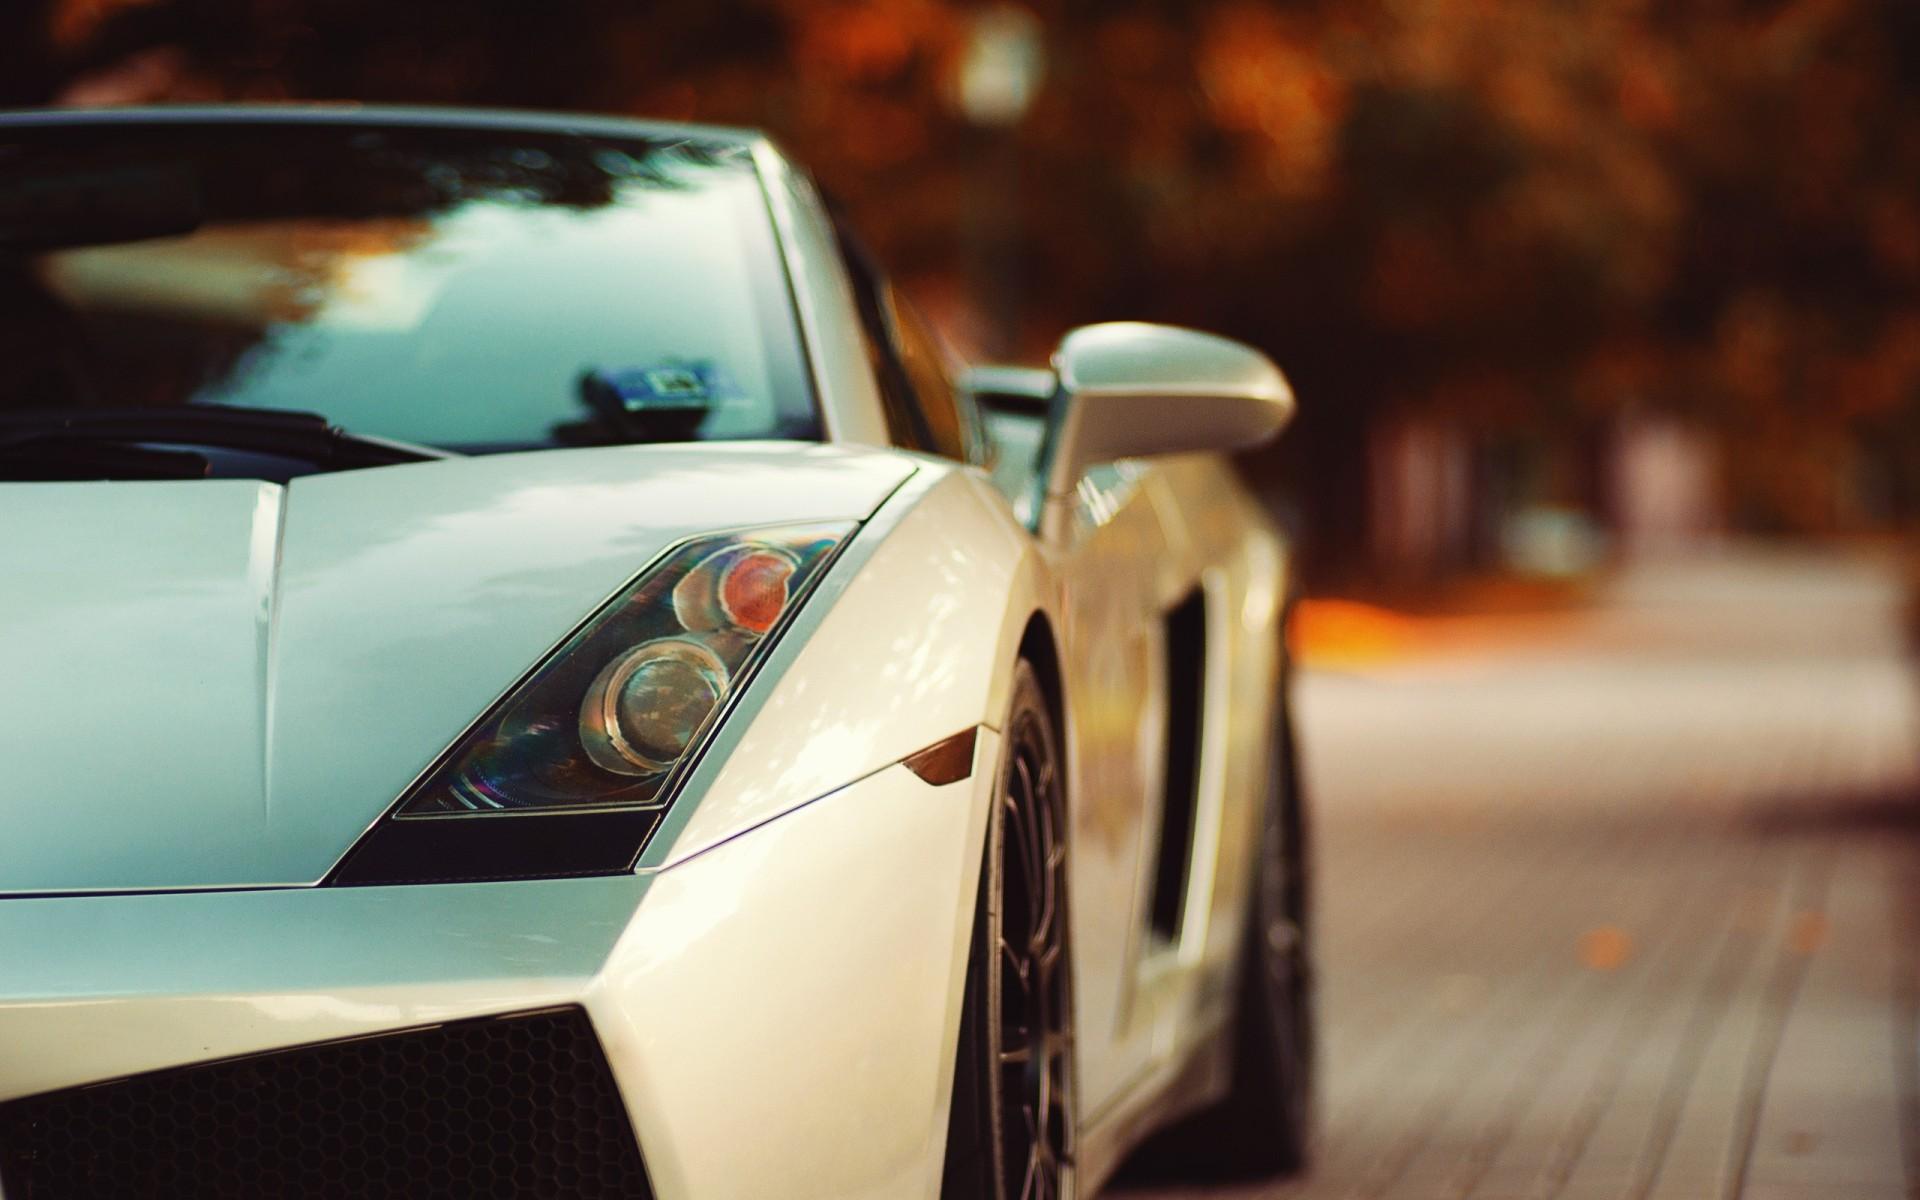 x 1200 - Super Cool Cars Wallpapers Hd